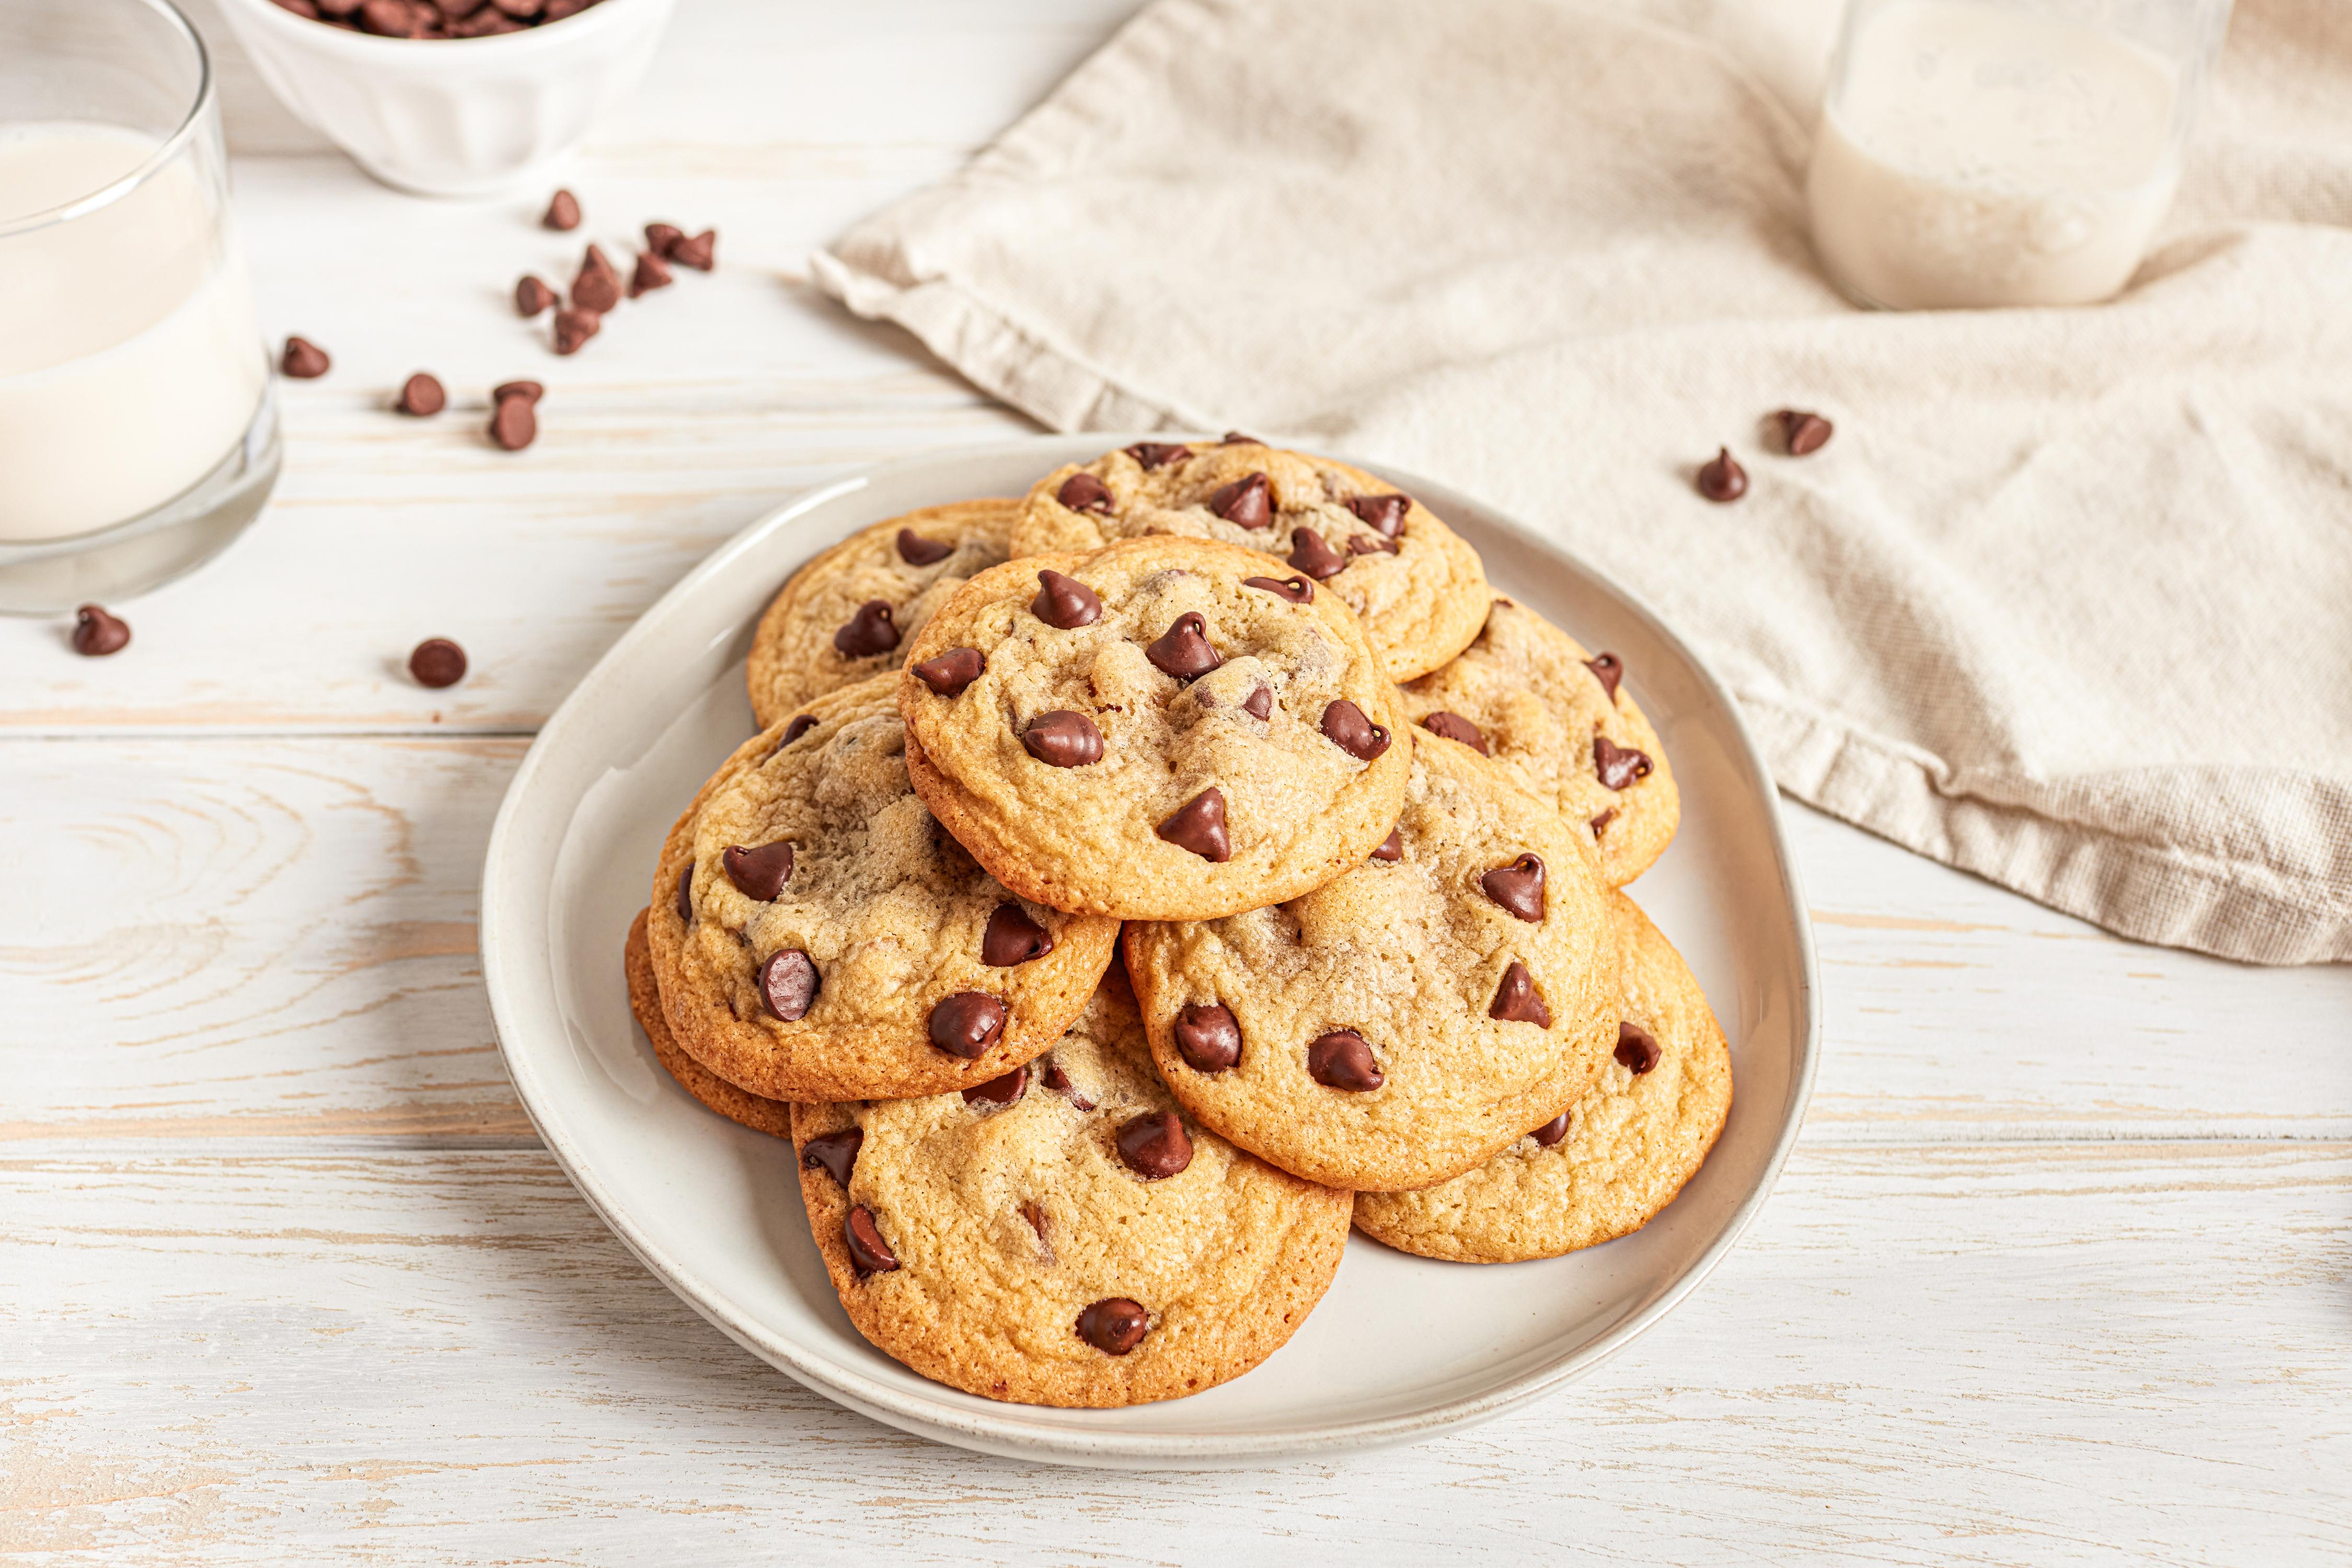 Original NTH Chocolate Chip Cookie